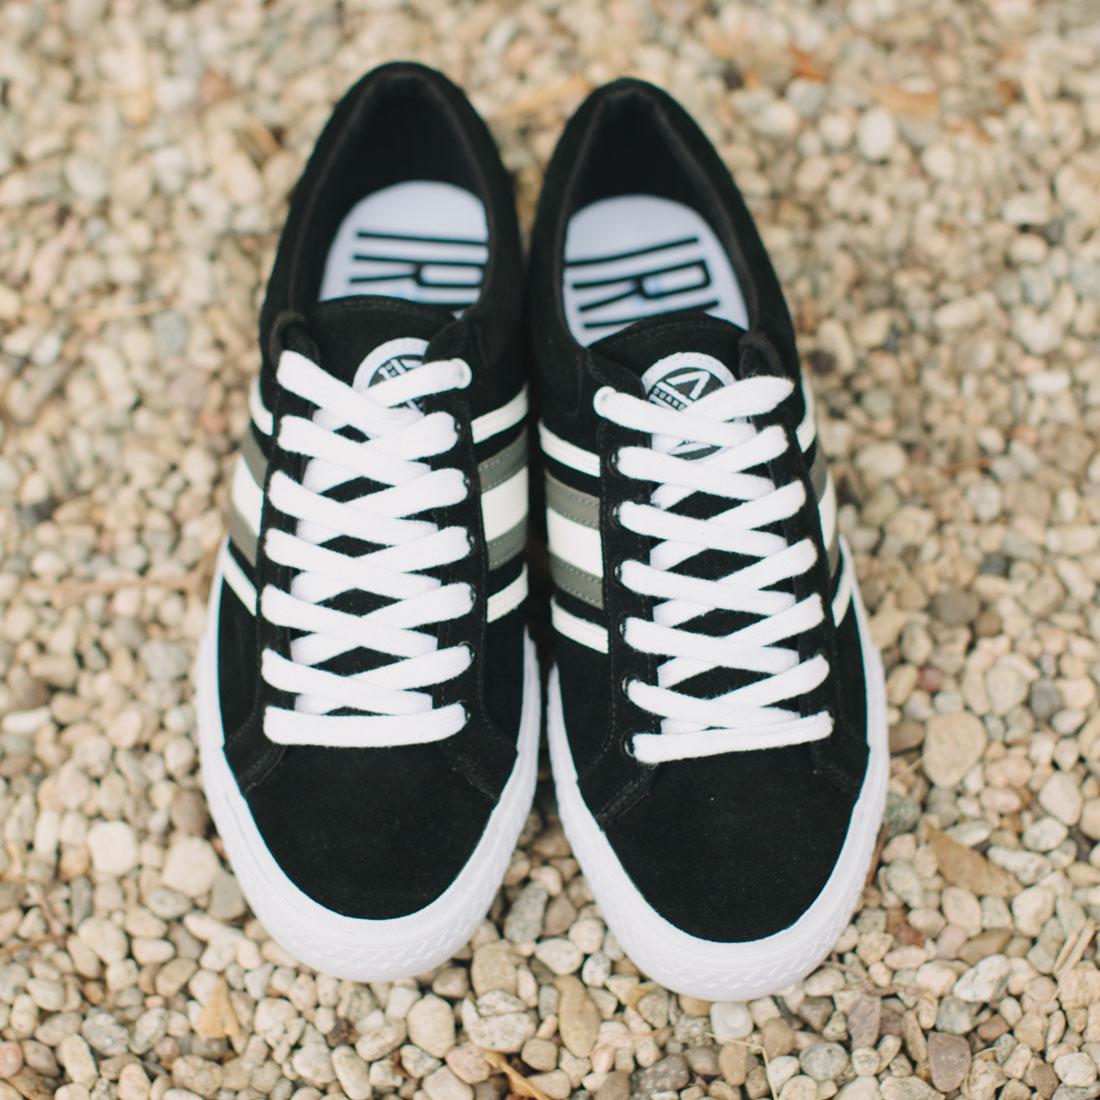 duane-peters-clasher-low-vulcanized-sneaker-black_white1100